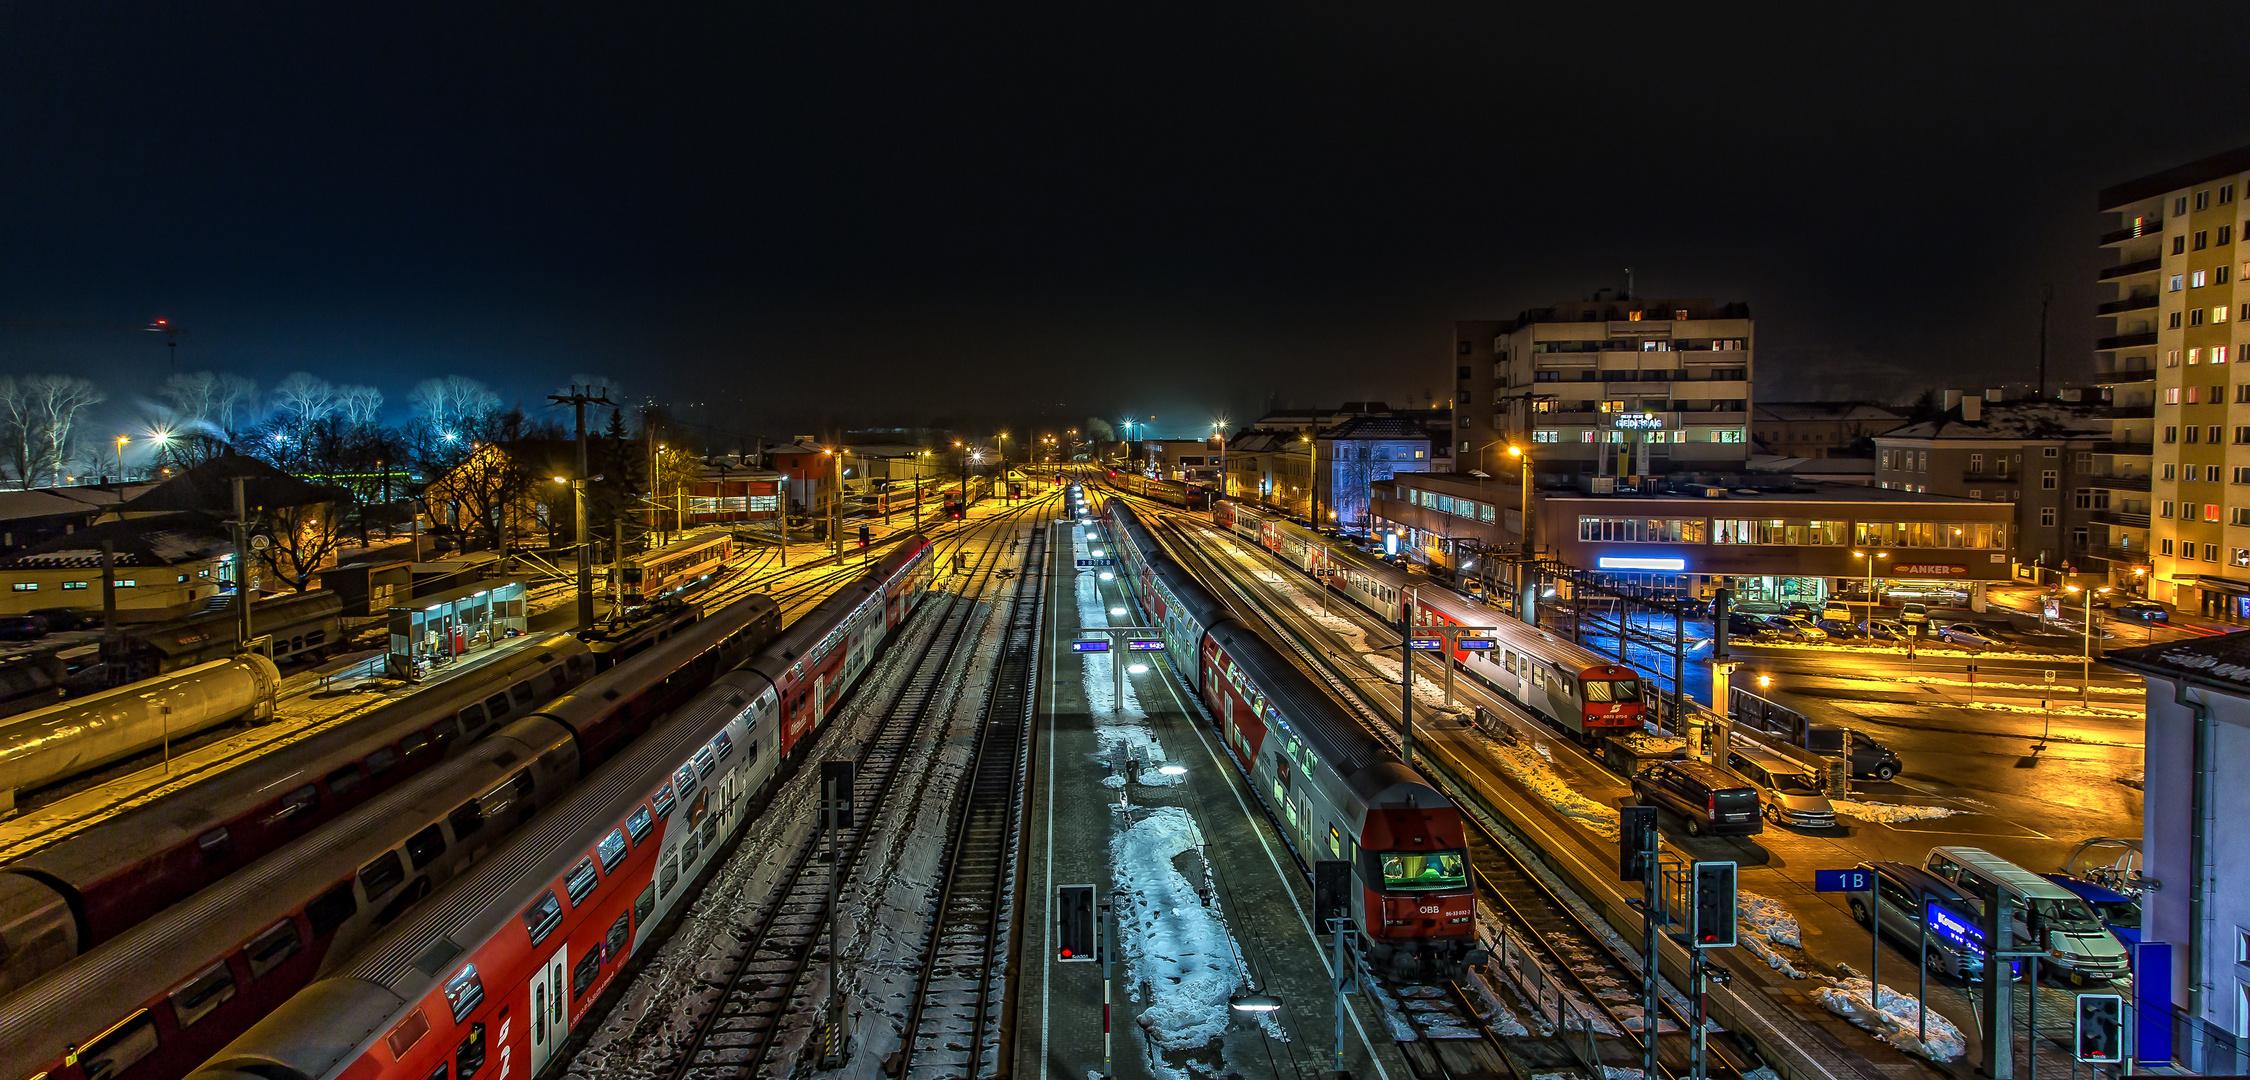 Bahnhof Krems an der Donau